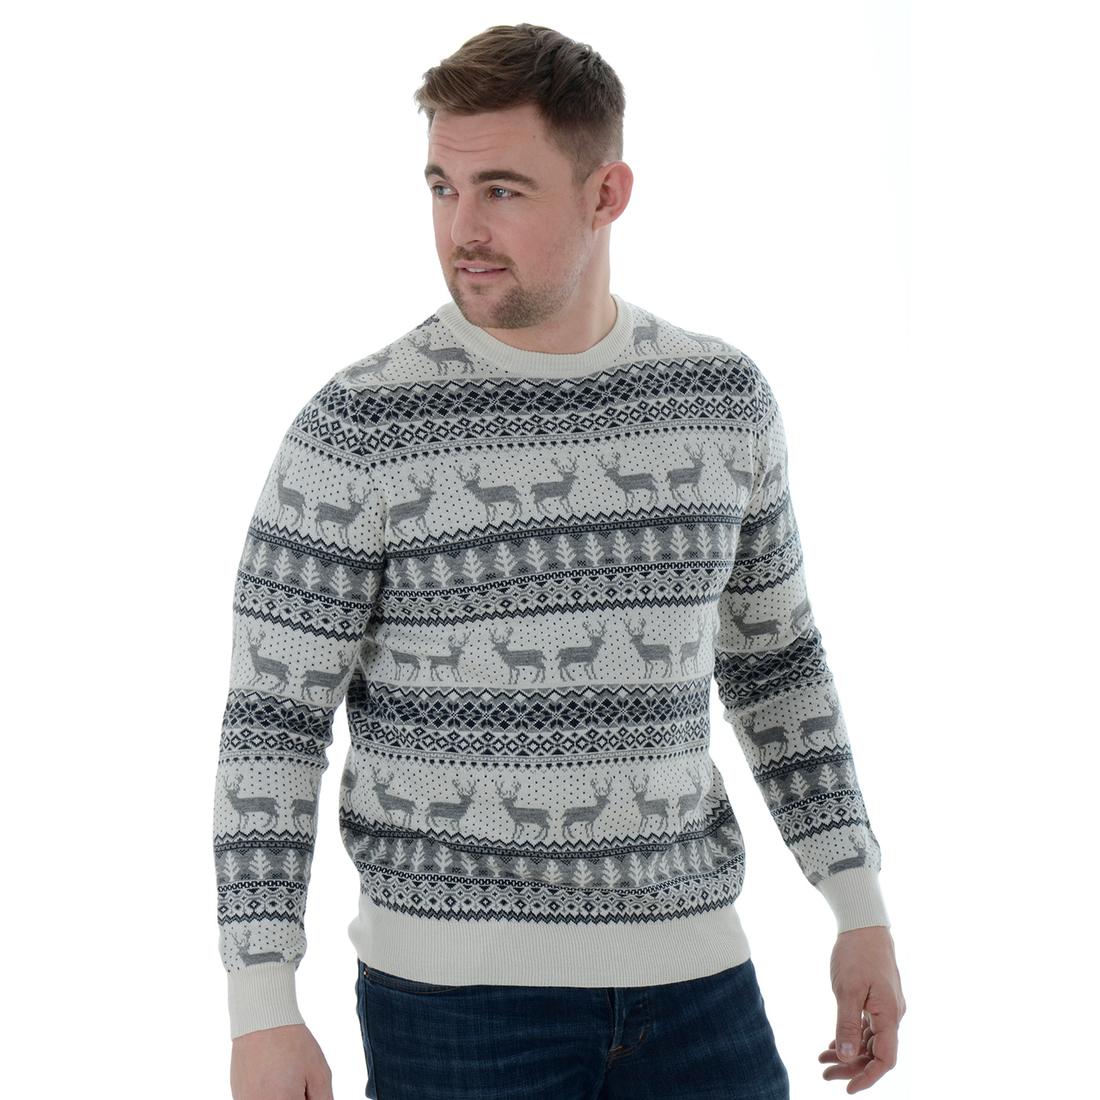 Vánoční svetr s norským vzorem šedý empty 26c1e8ef1d